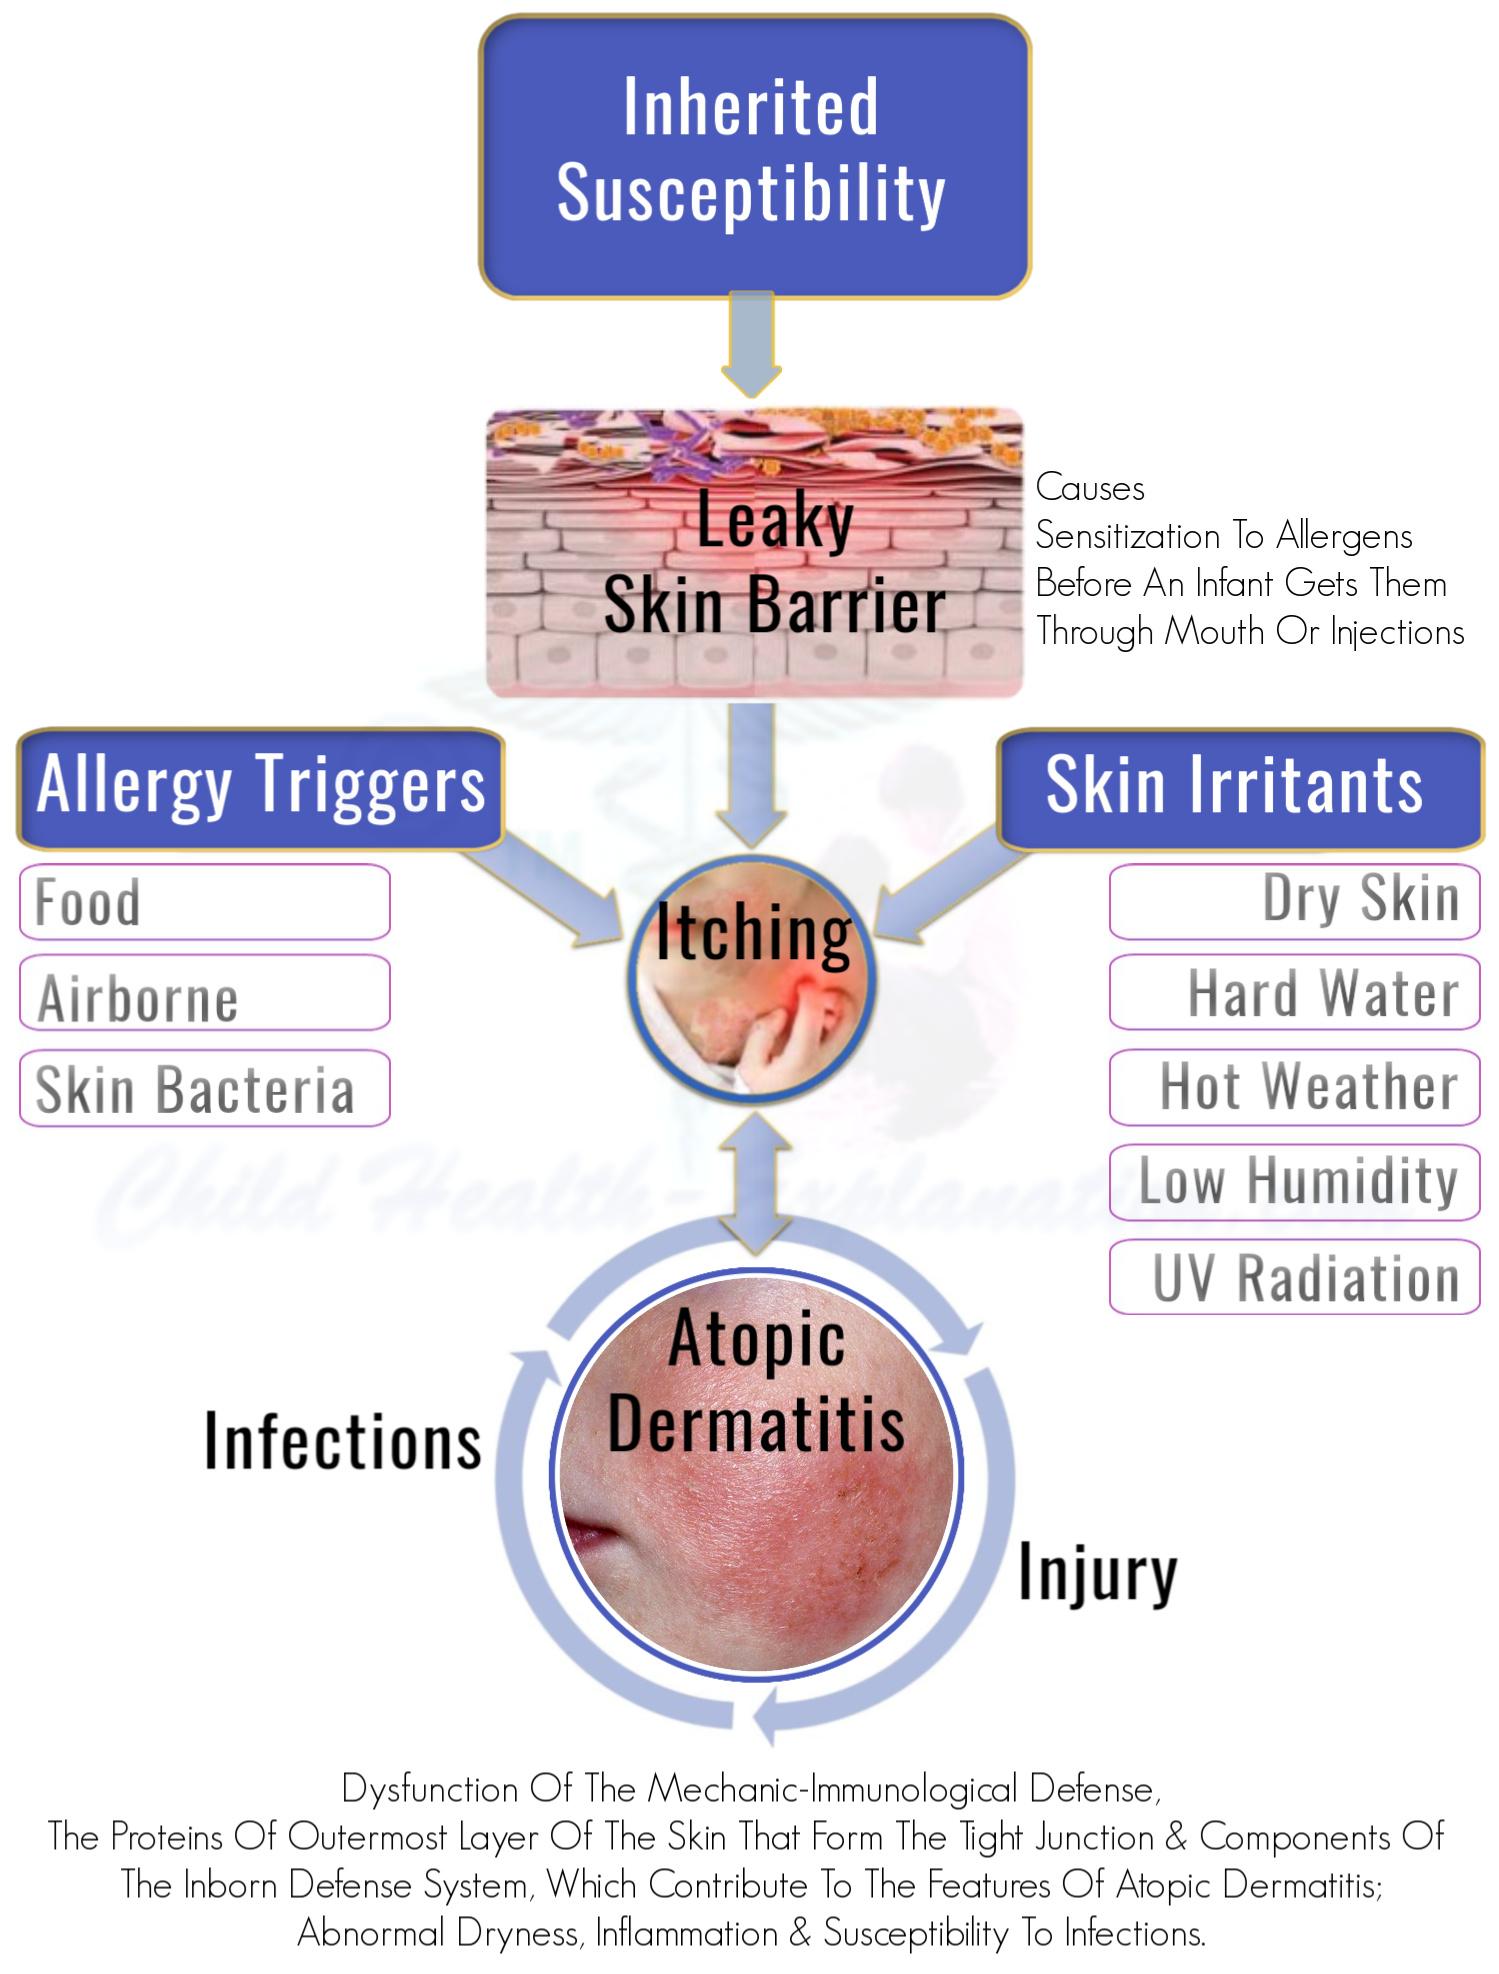 Pathogenesis of Atopic Dermatitis: Mechanism of Development of The Disease